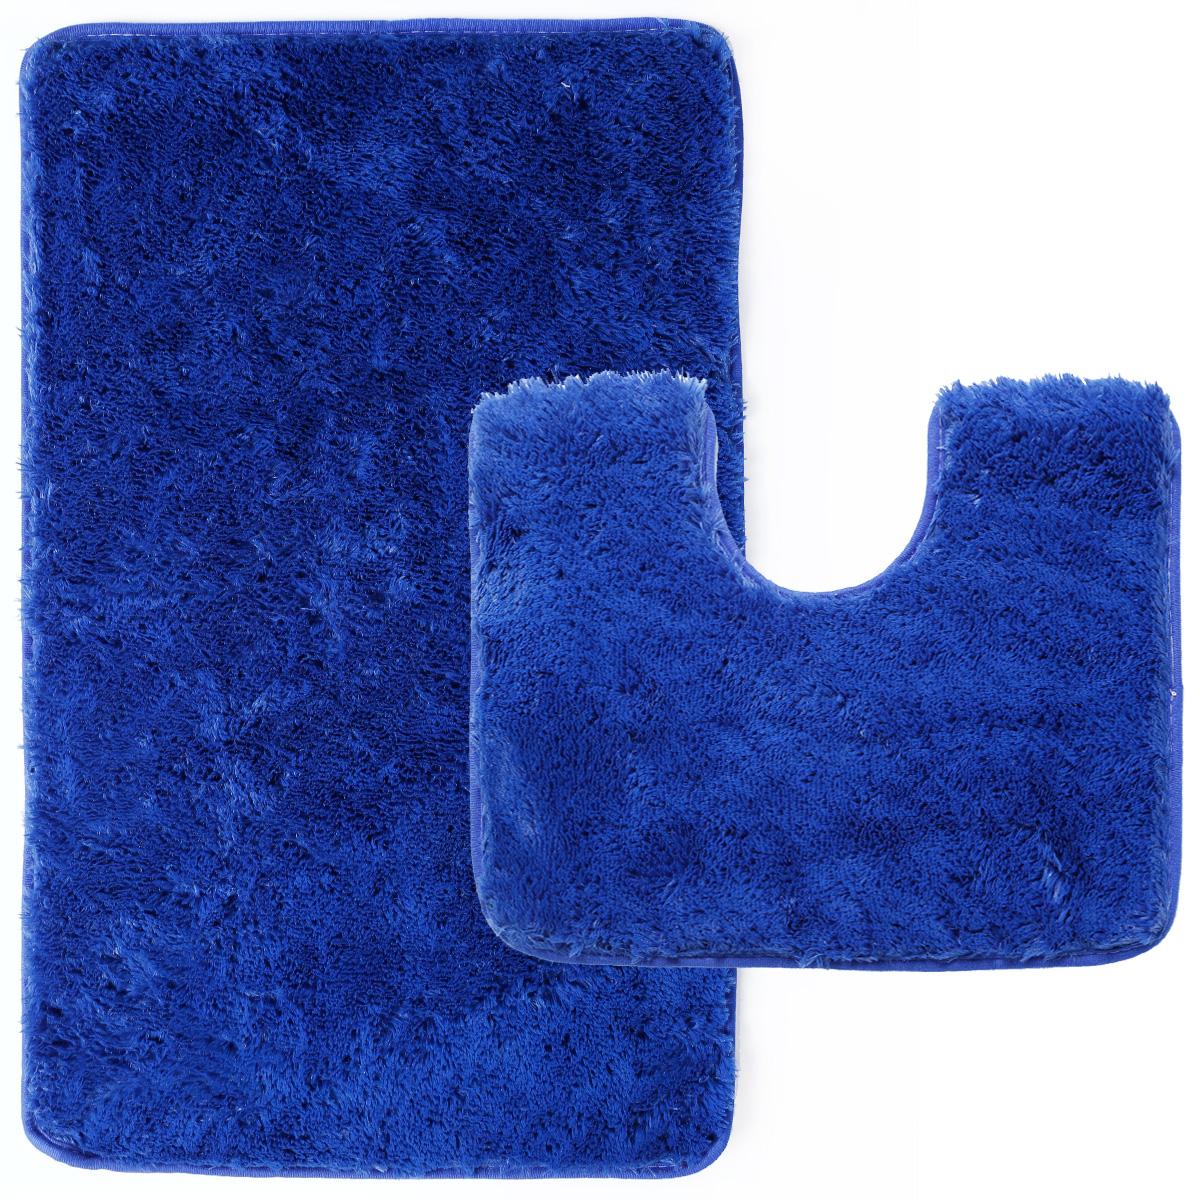 Badvorleger Set badteppich 2 teilig blau badematte badvorleger badgarnitur duschvorleger set ebay